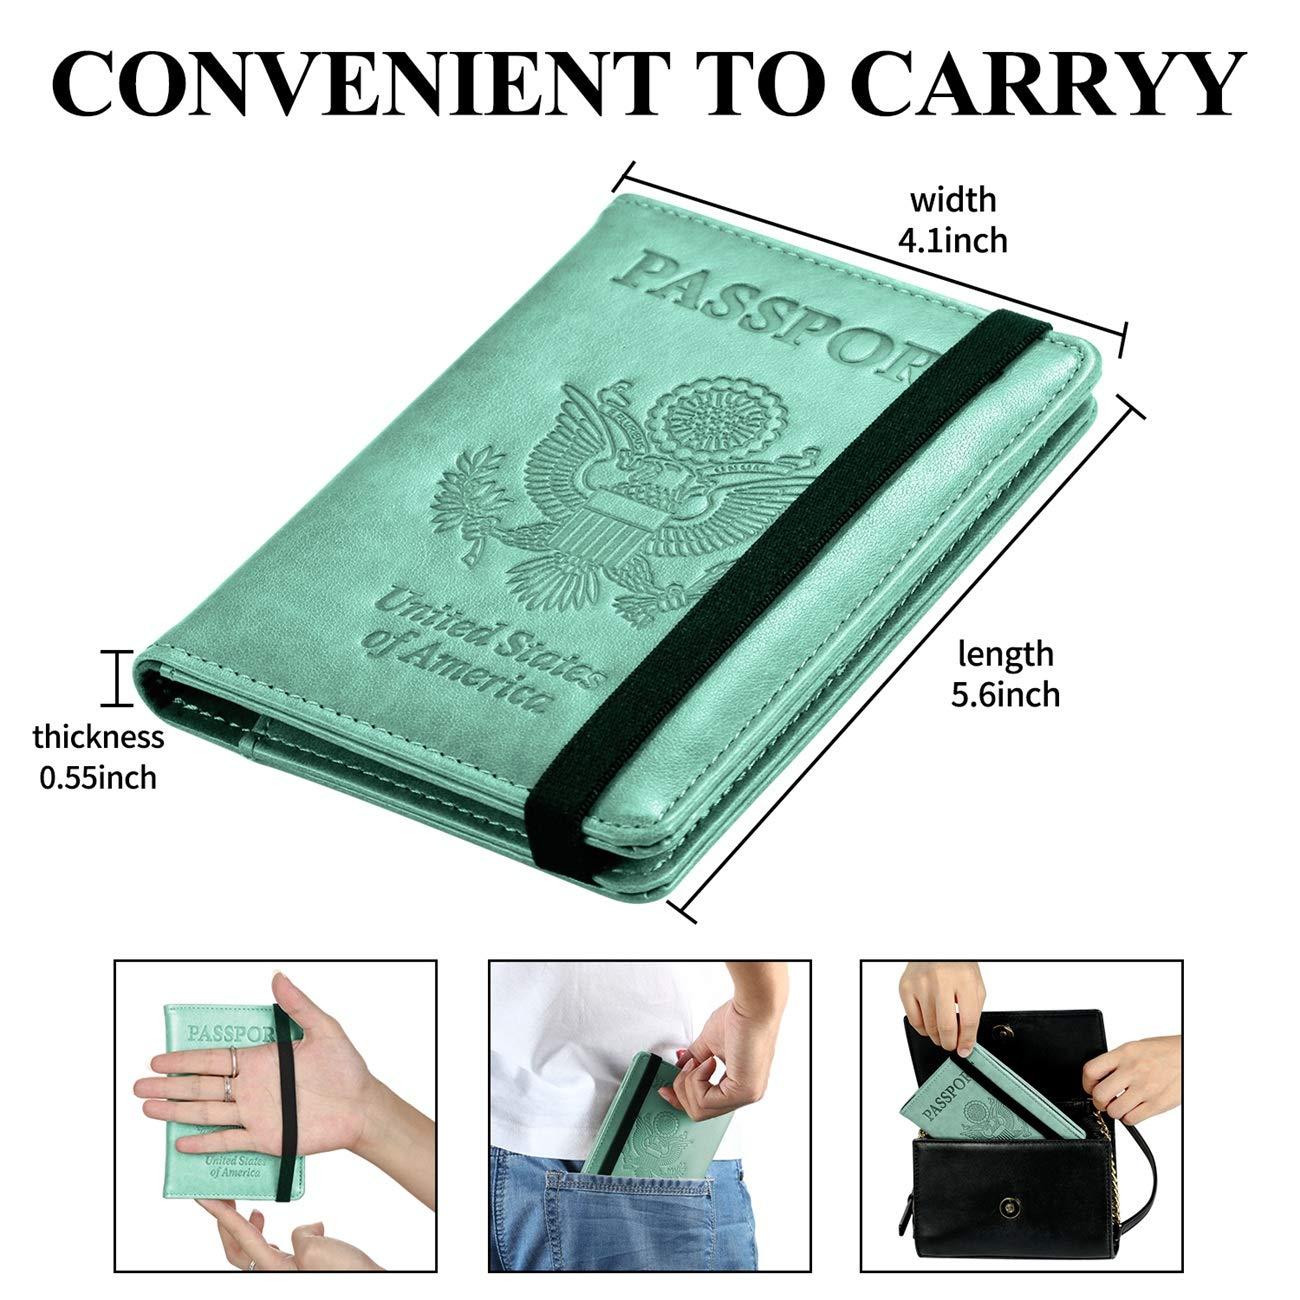 Passport Holder Cover Travel Wallet RFID Blocking Leather Card Case